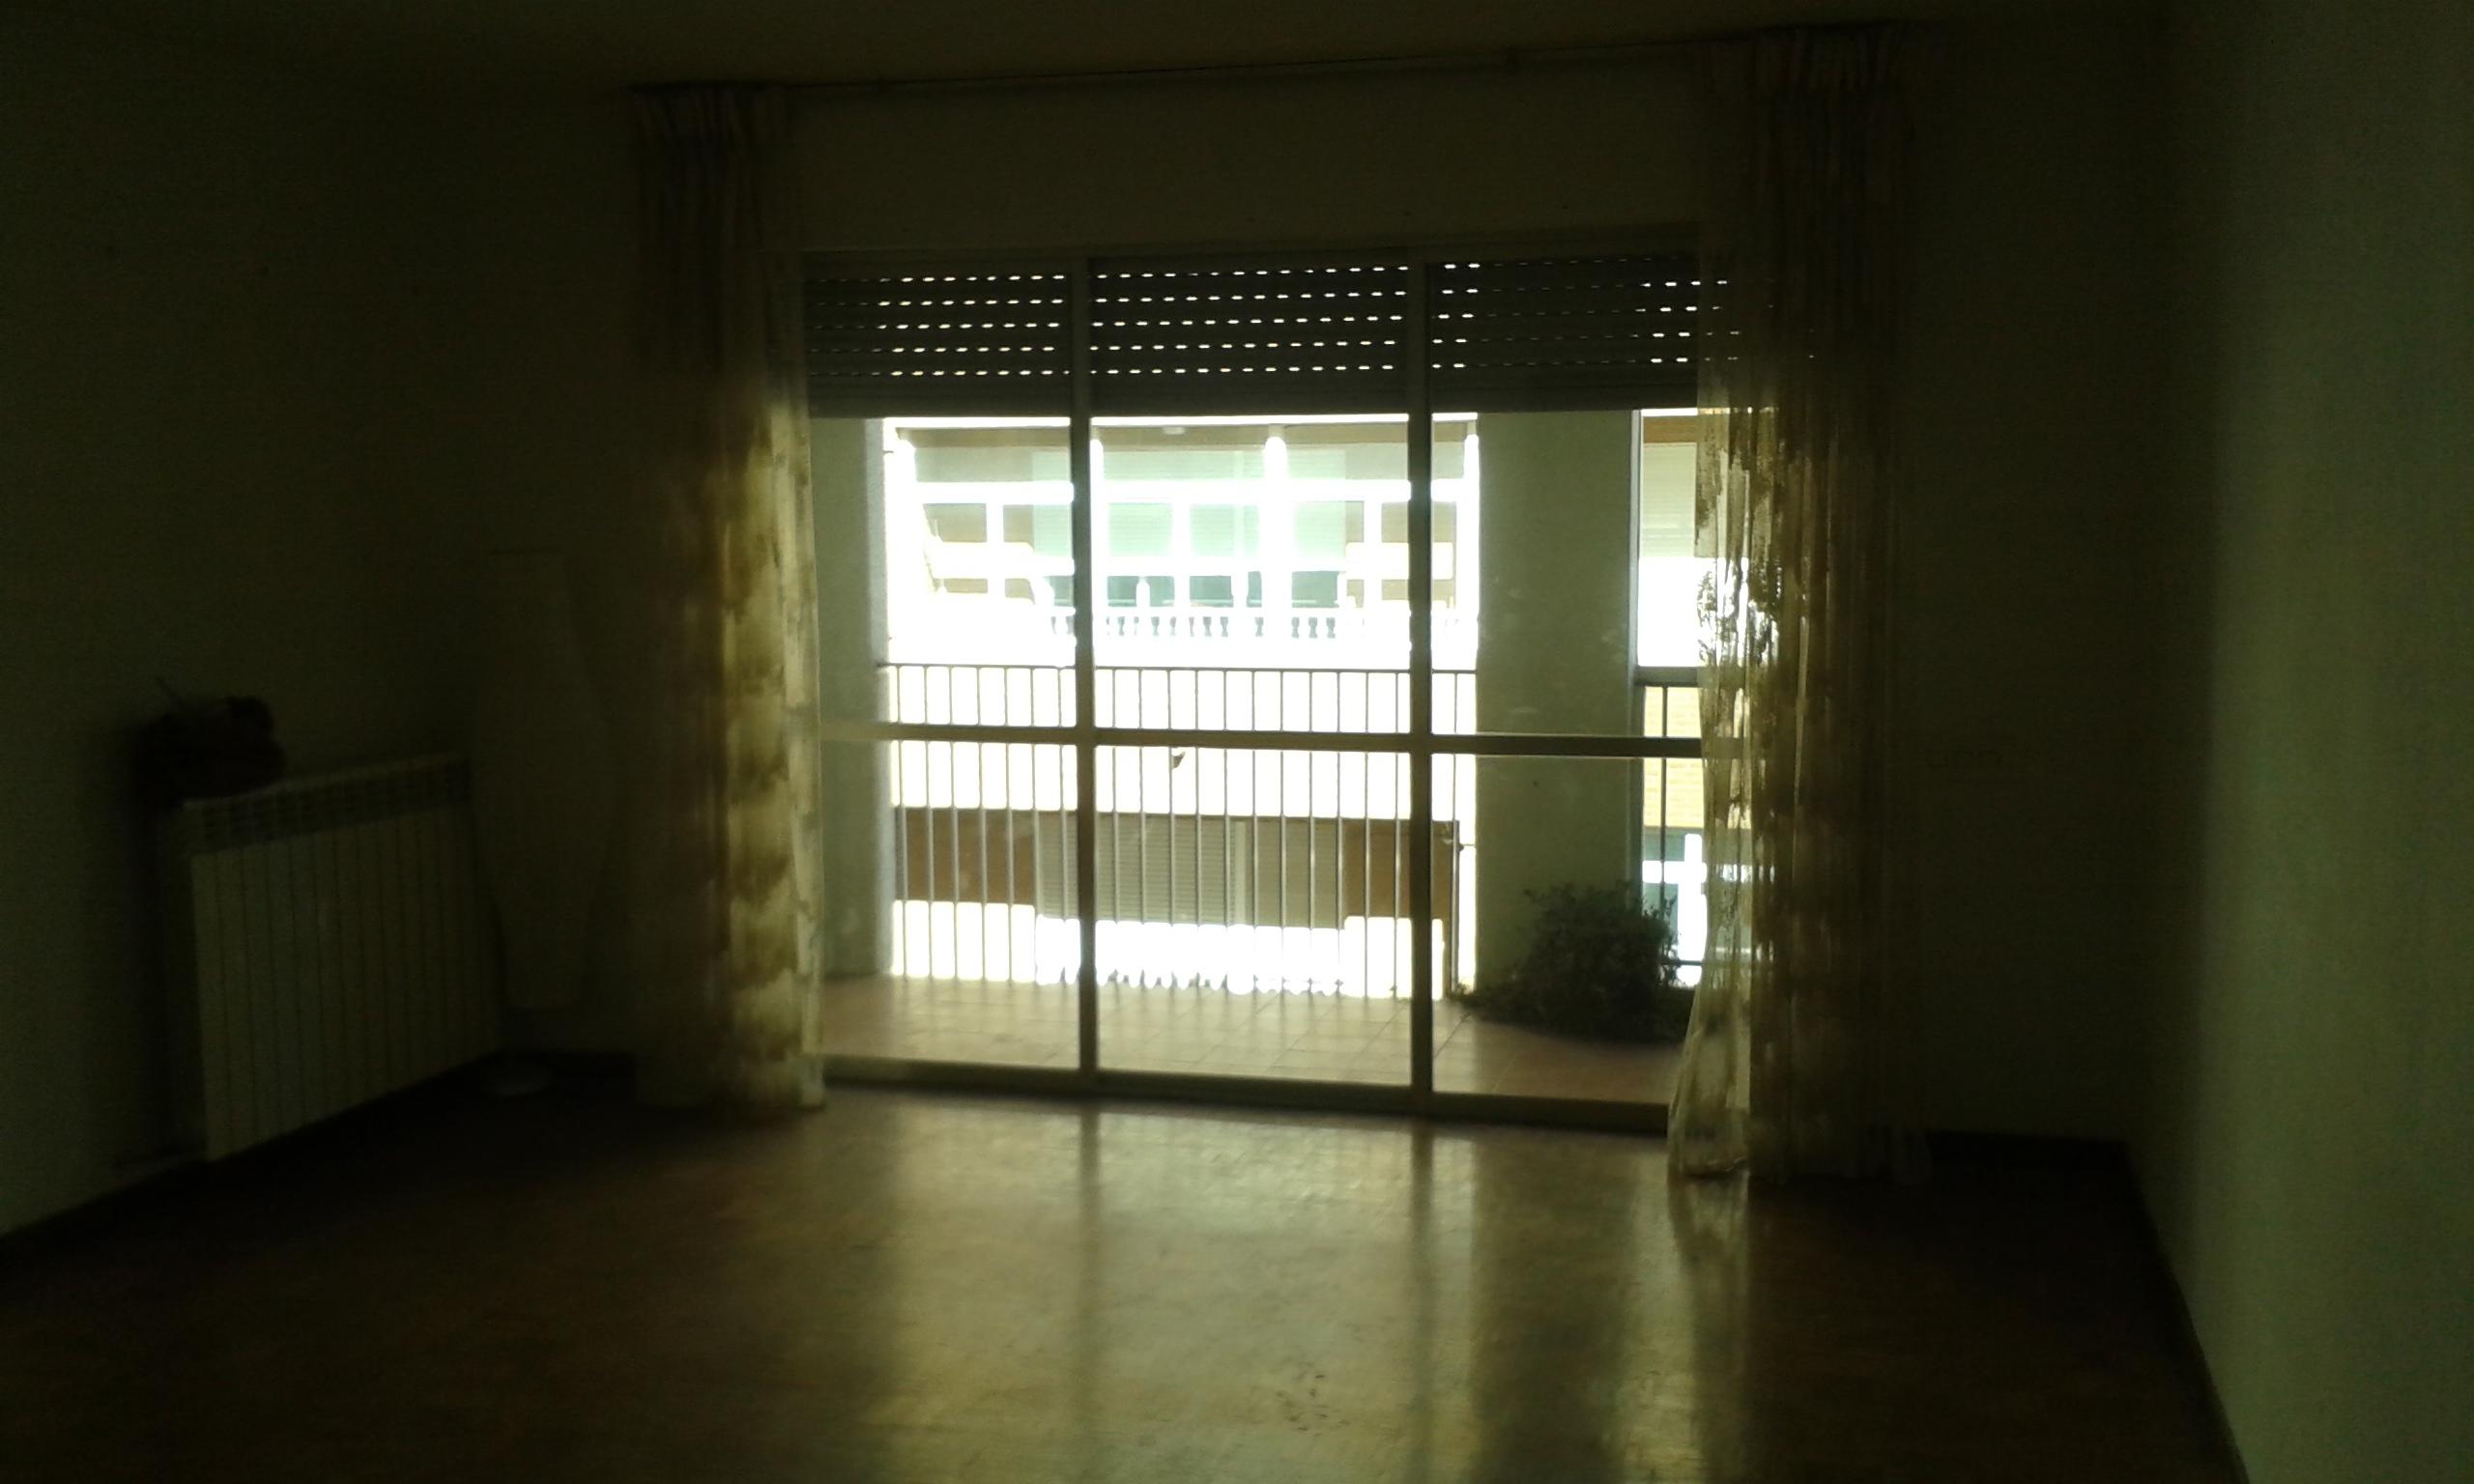 Piso 4 dormitorios z candelaria alquilia duri for Piso 4 dormitorios sevilla